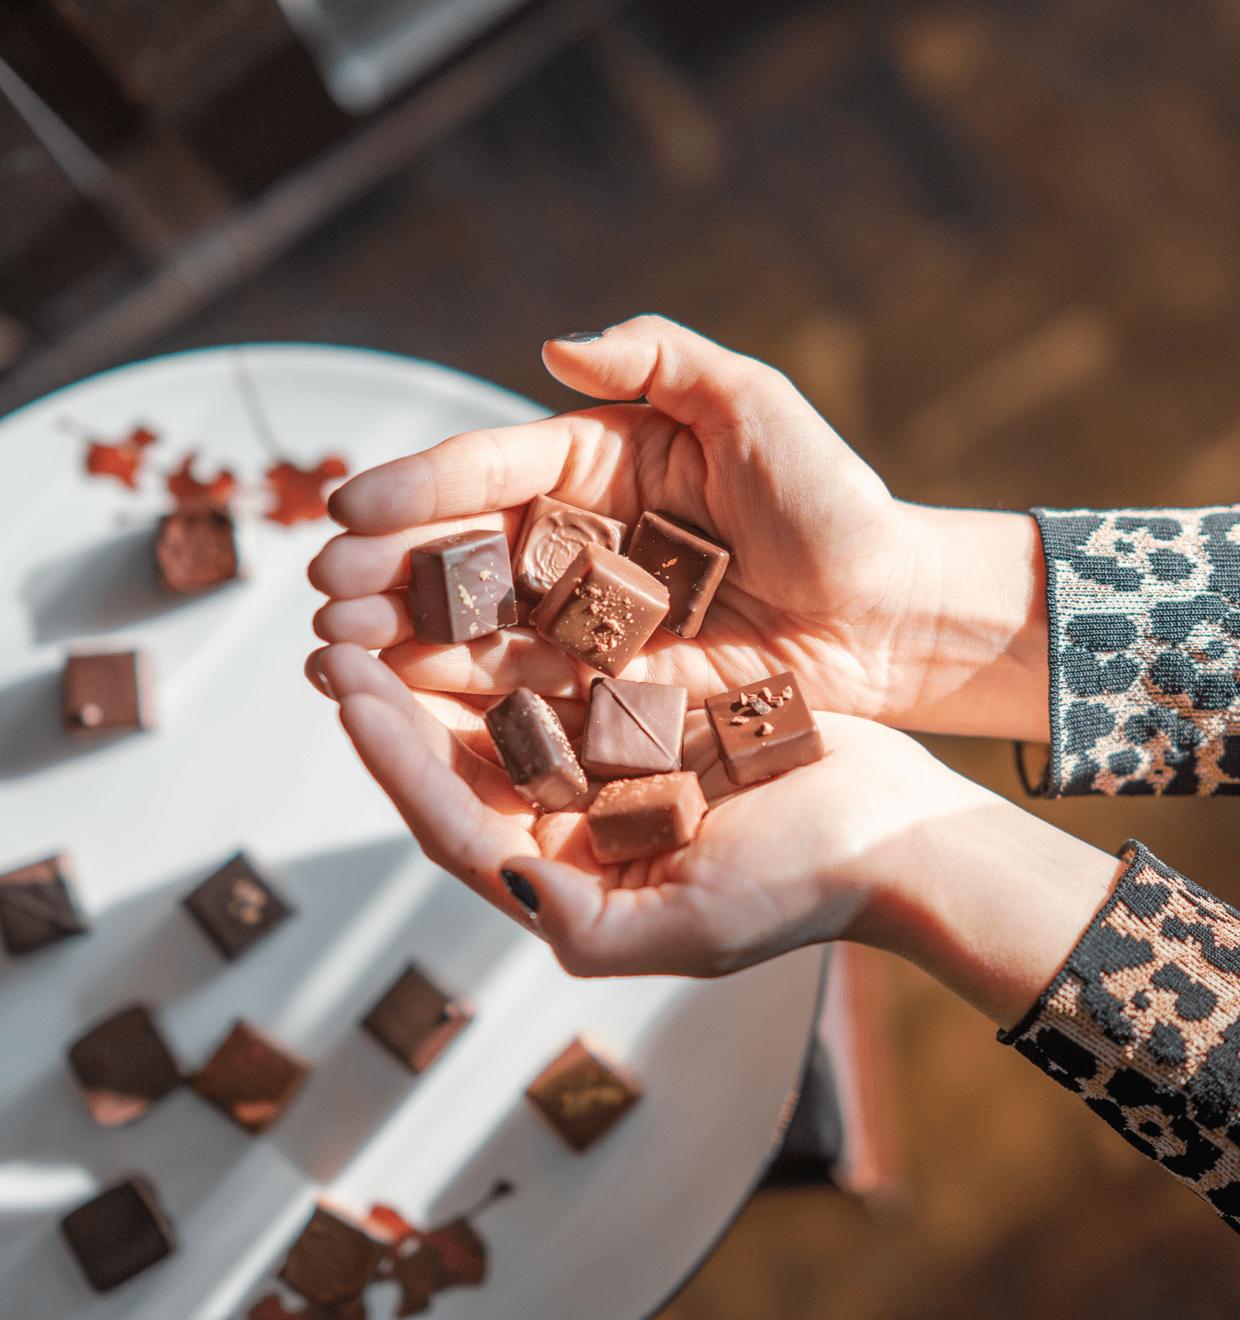 zChocolat promo photo of hands holding chocolate